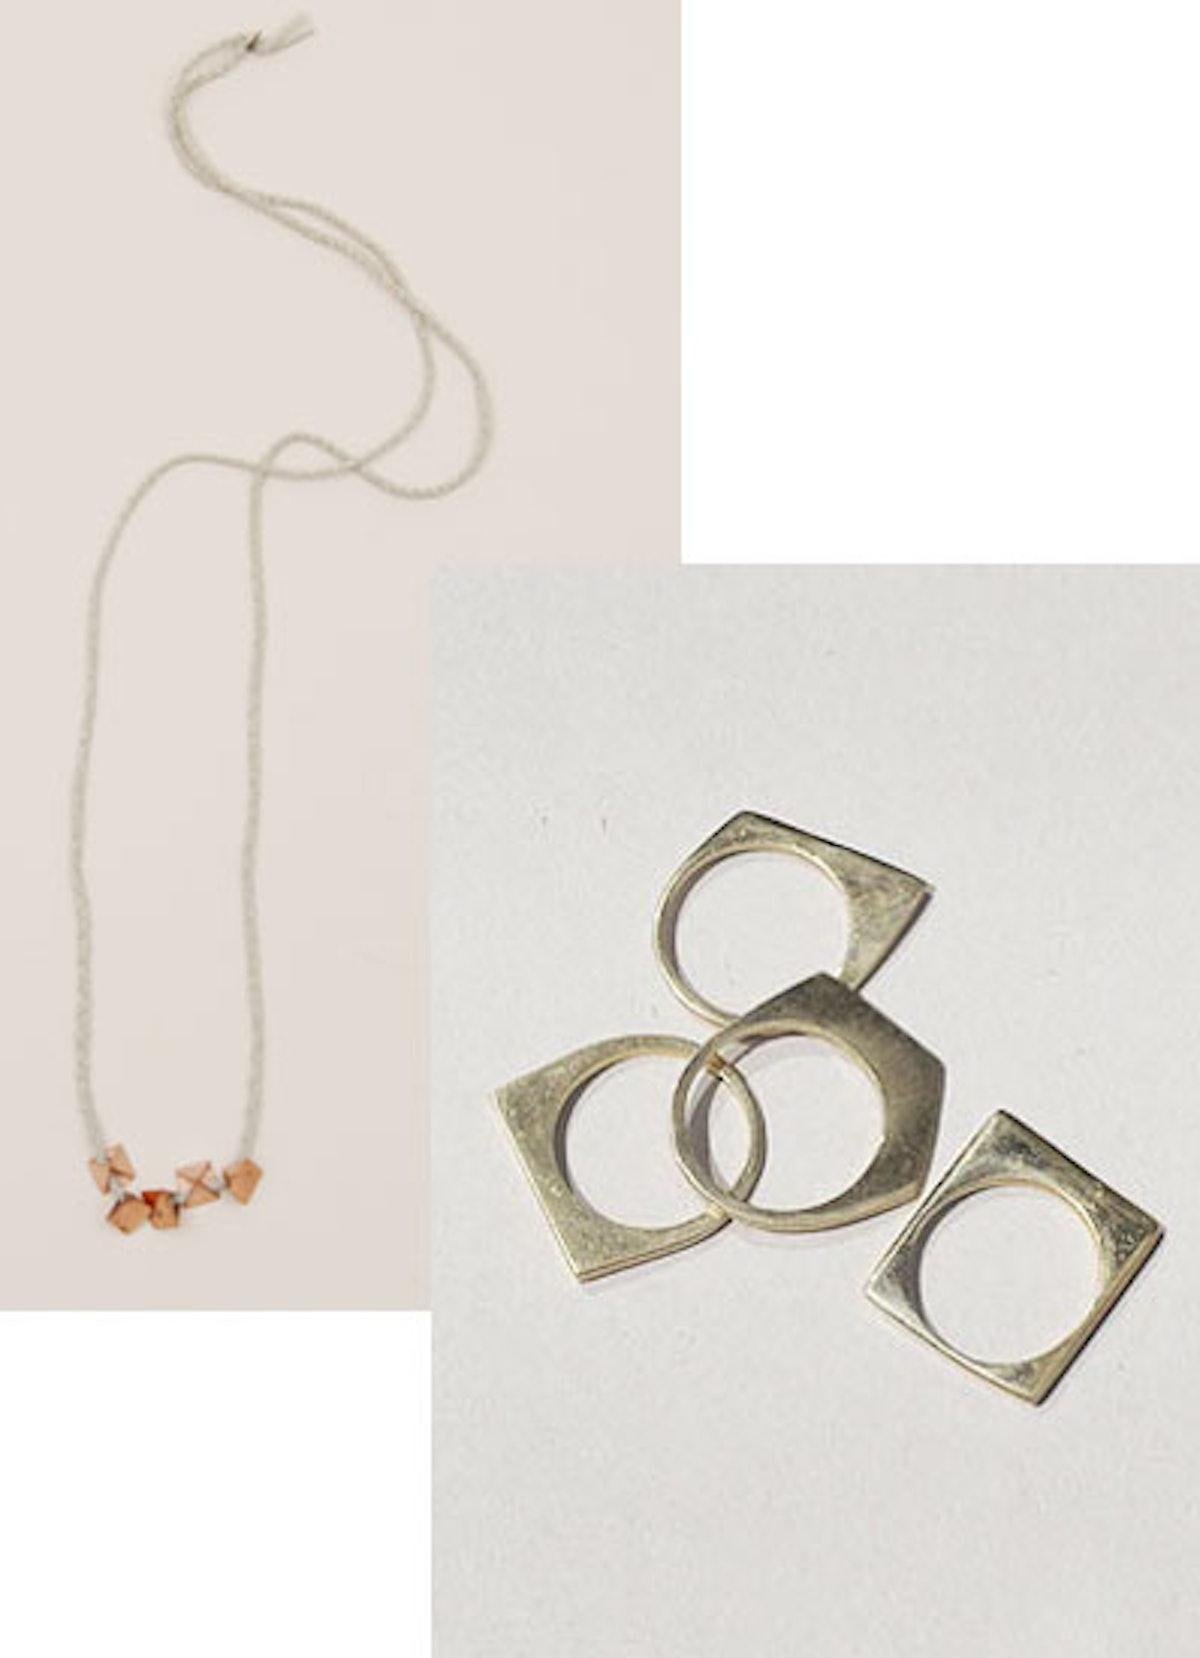 acss-brooklyn-jewelry-03-v.jpg